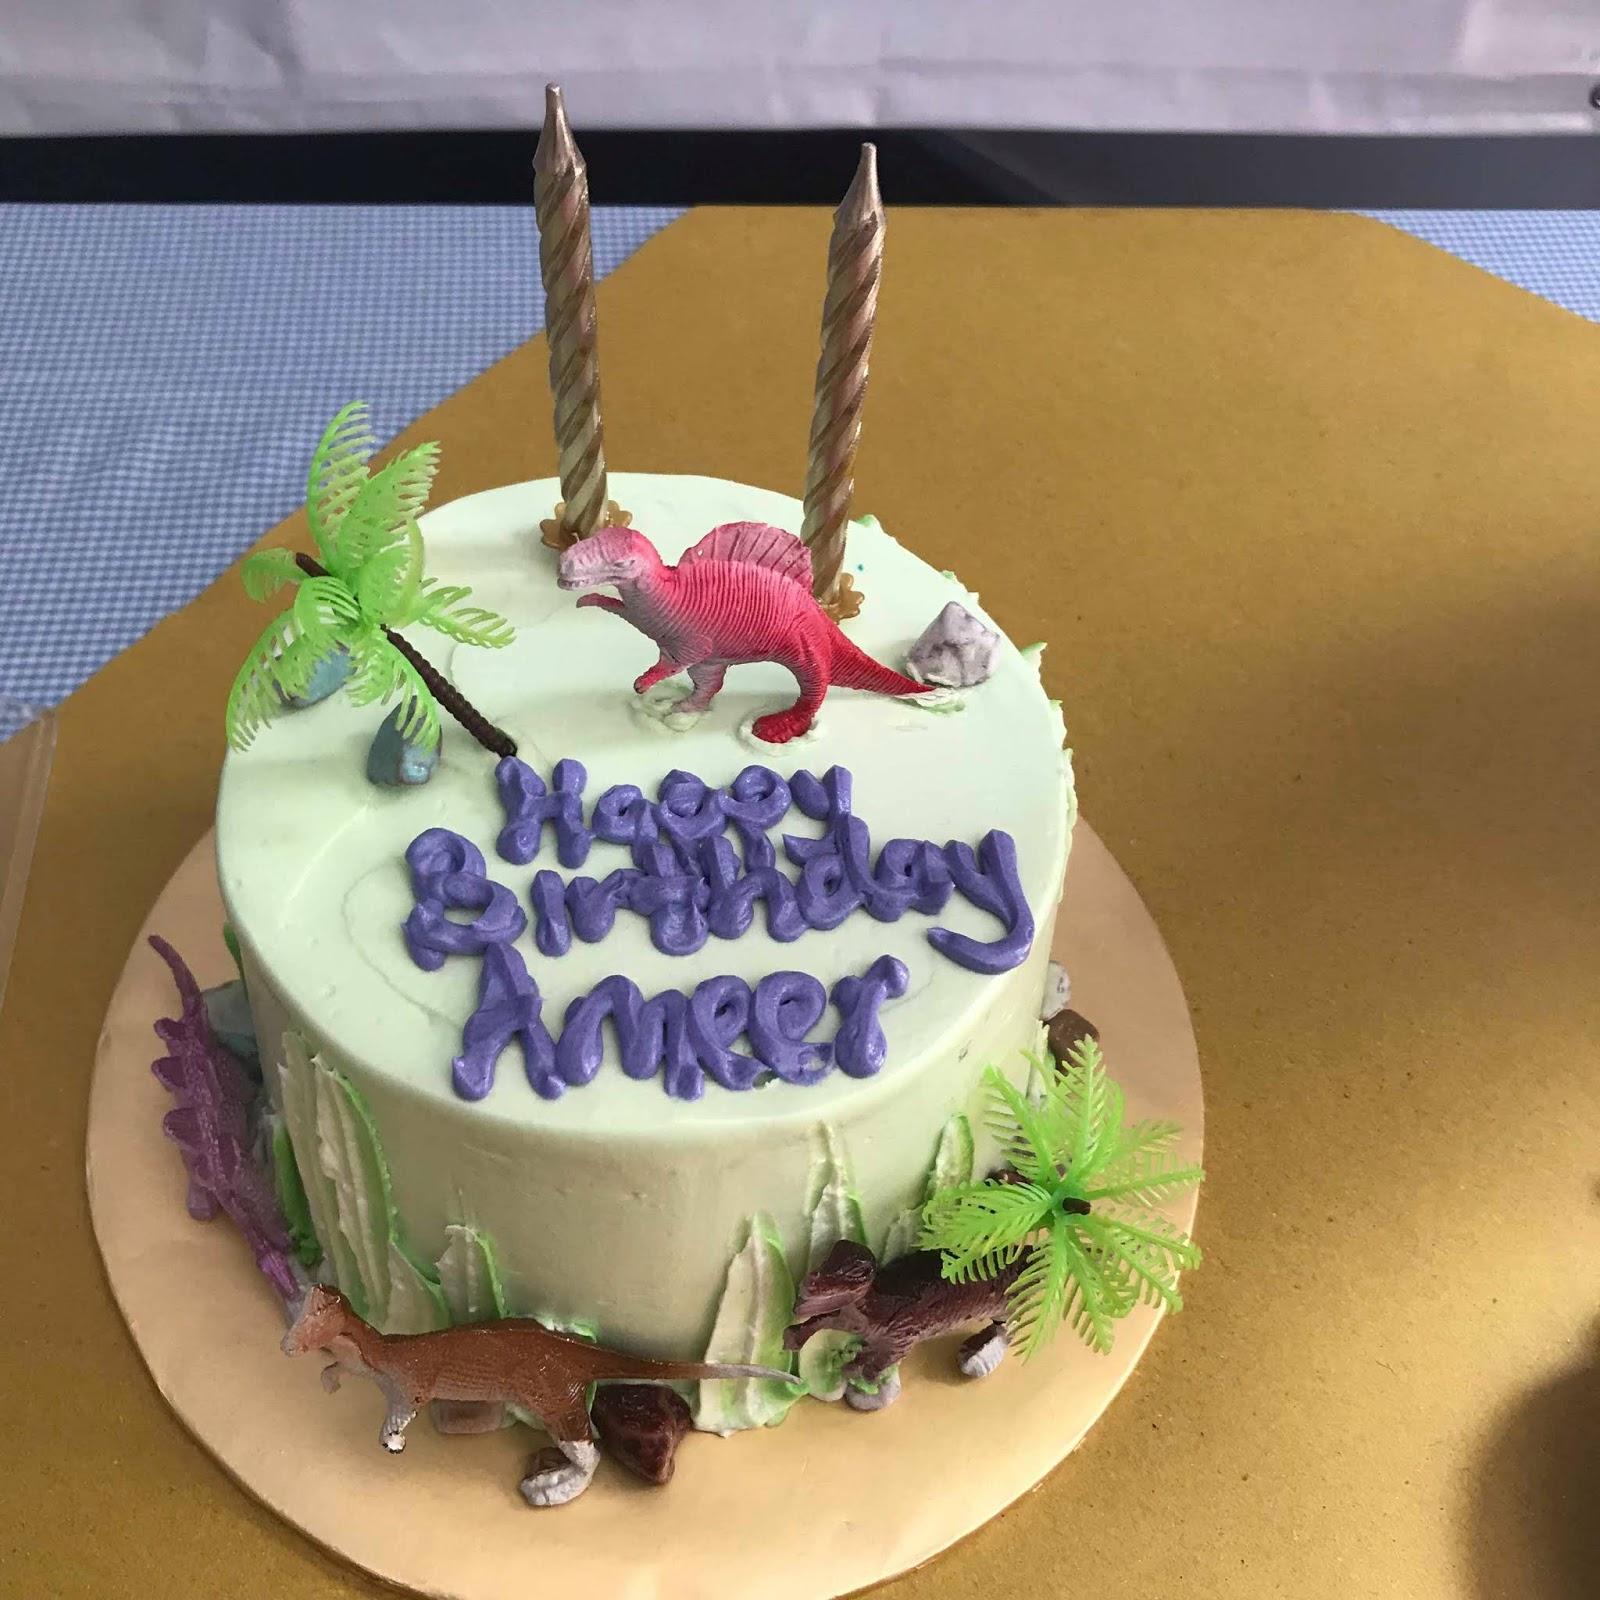 Kemeriahan Sambutan Hari Lahir Ameer Yang Ke 4 Tahun Di Ice Age Alive Kuala Lumpur Enchanted Life Begins